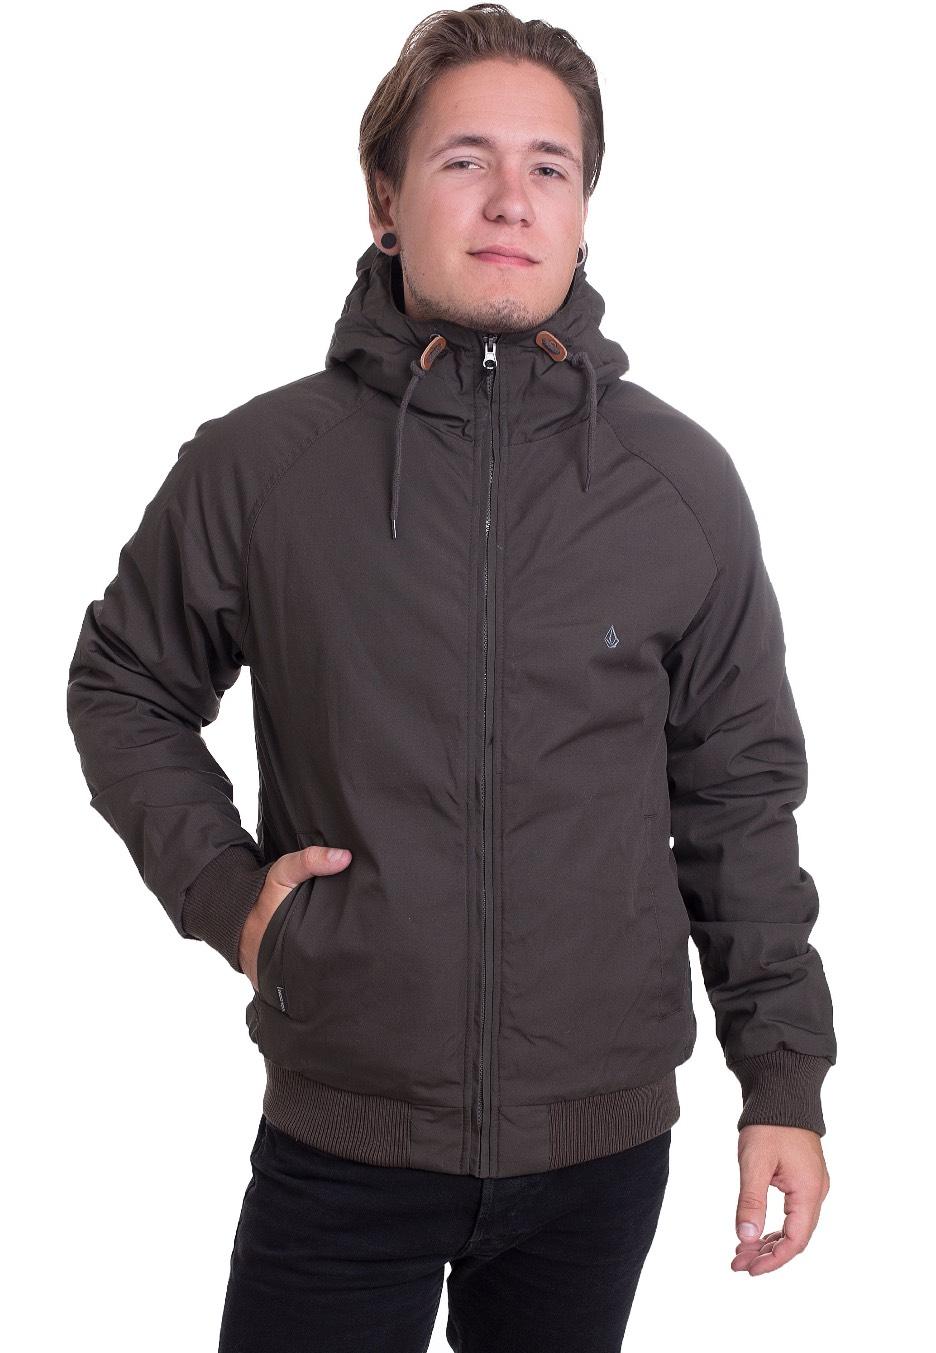 e960b358c244 Volcom - Hernan Lead - Jacket - Streetwear Shop - Impericon.com UK